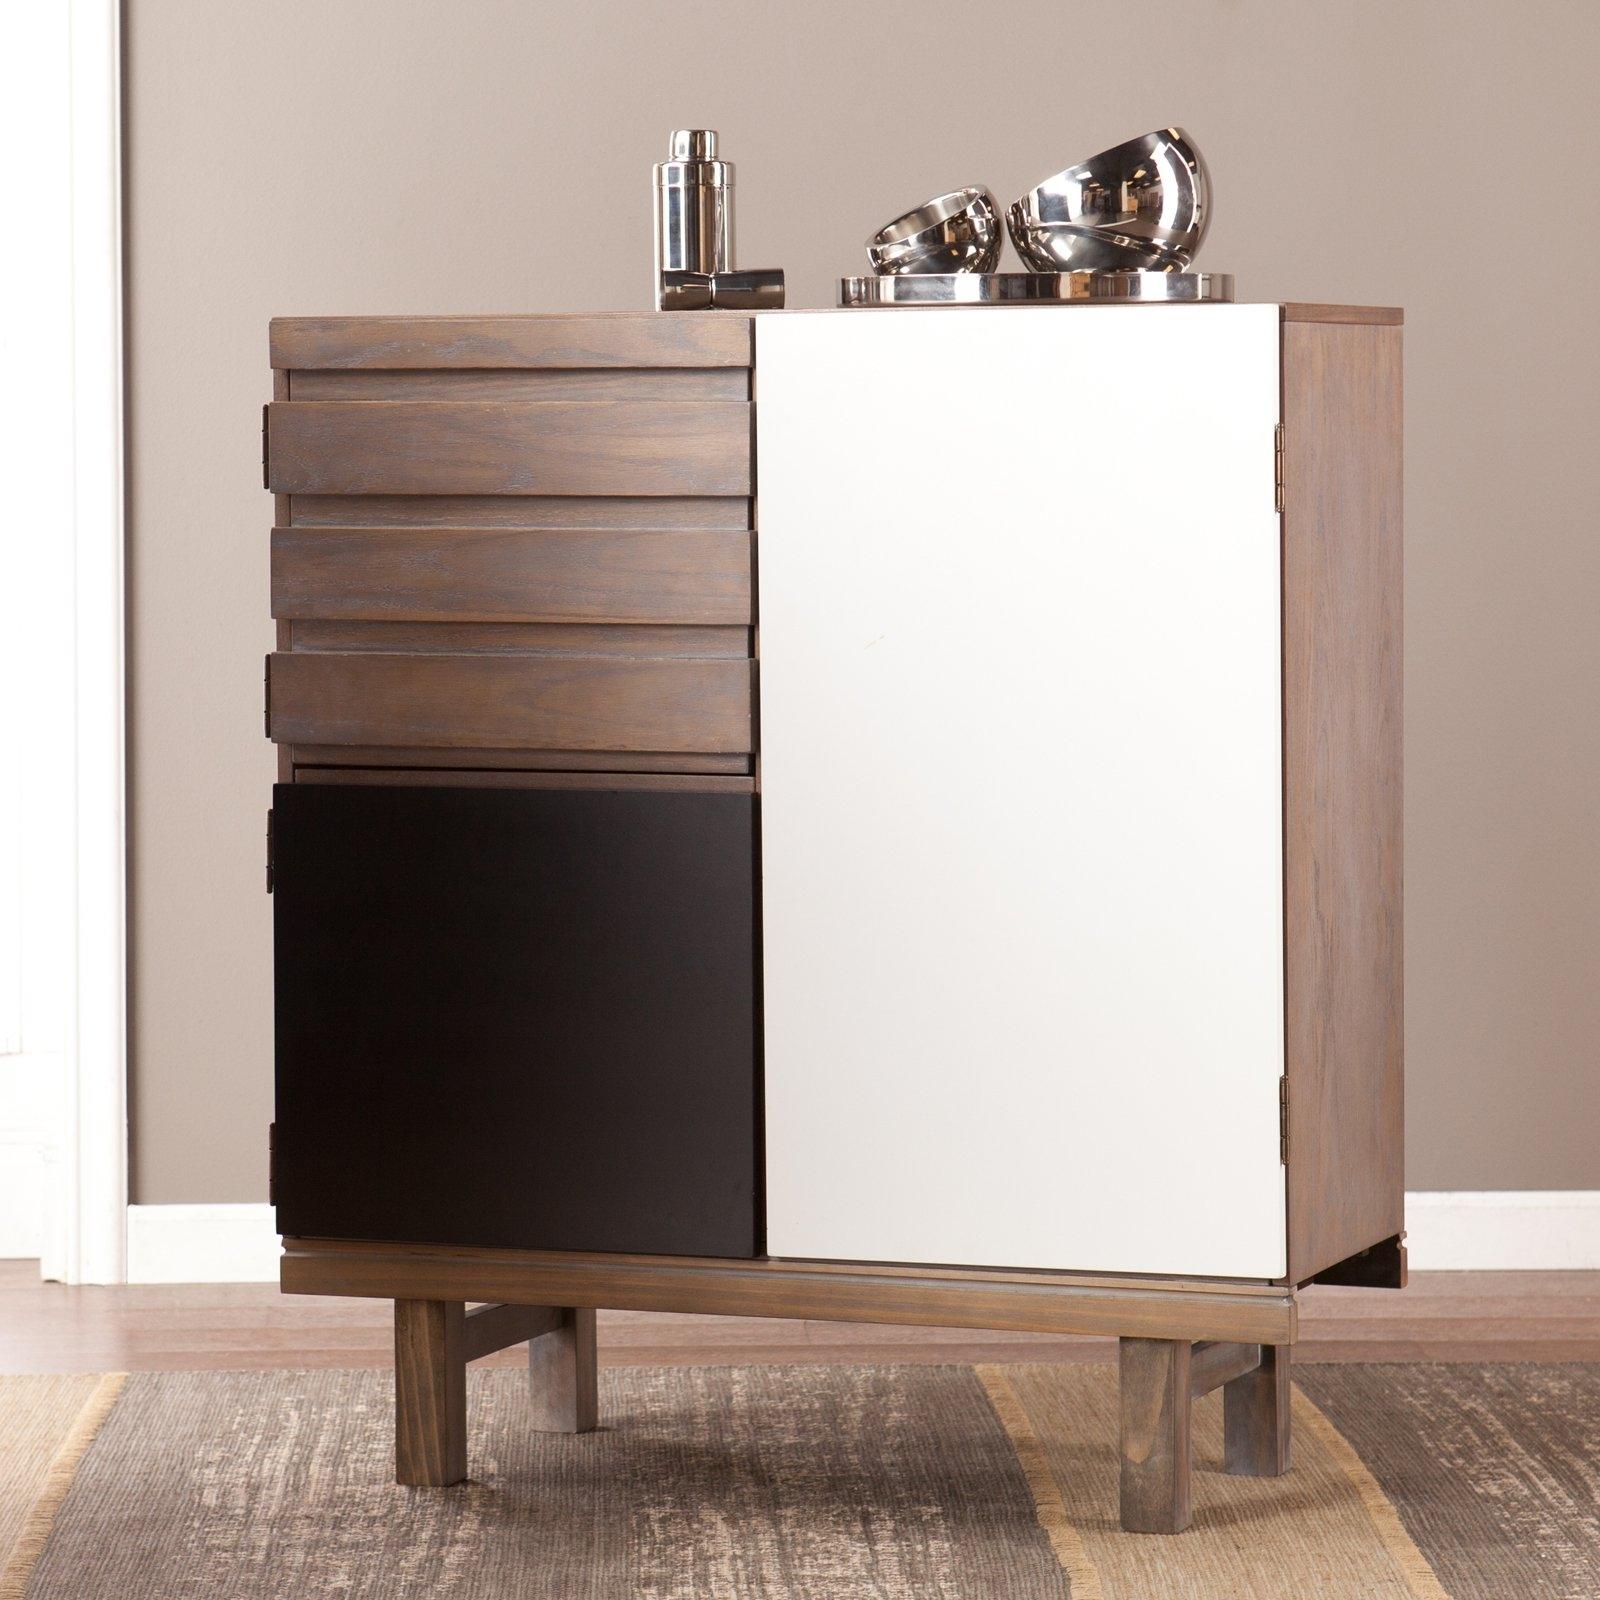 Holly & Martin Chaz Cabinet, Mid-Century Modern, Burnt Oak - Walmart throughout Black Burnt Oak Sideboards (Image 11 of 30)